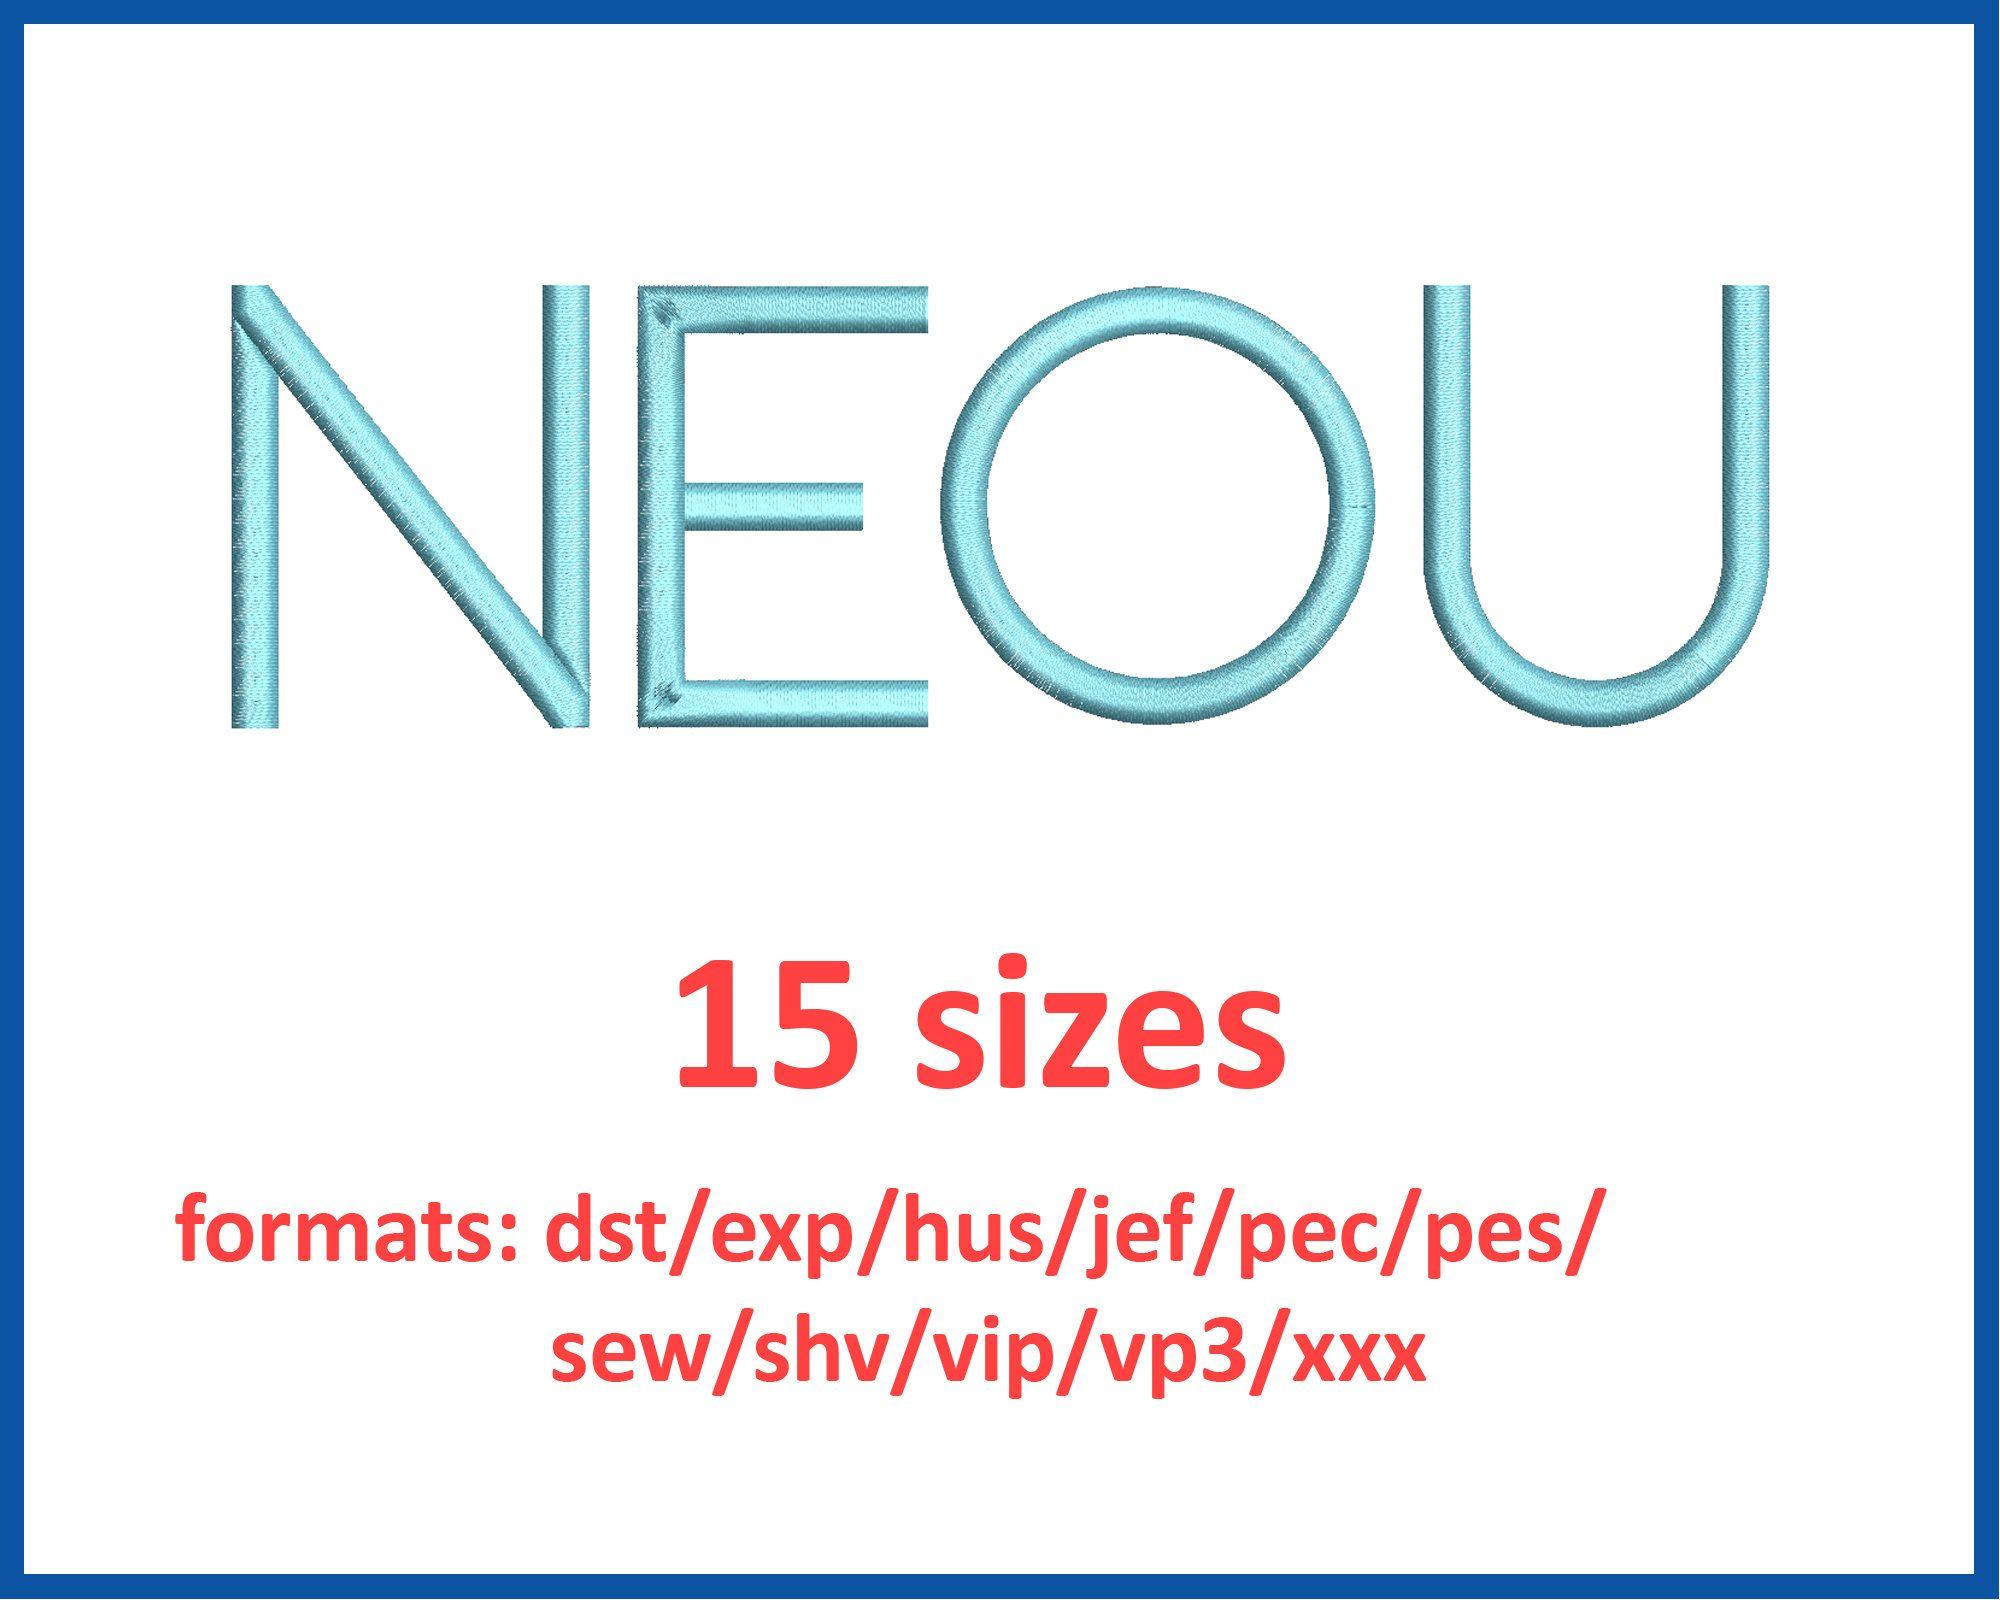 NEOU font embroidery design 15 sizes 0.25(1/4), 0.5(1/2